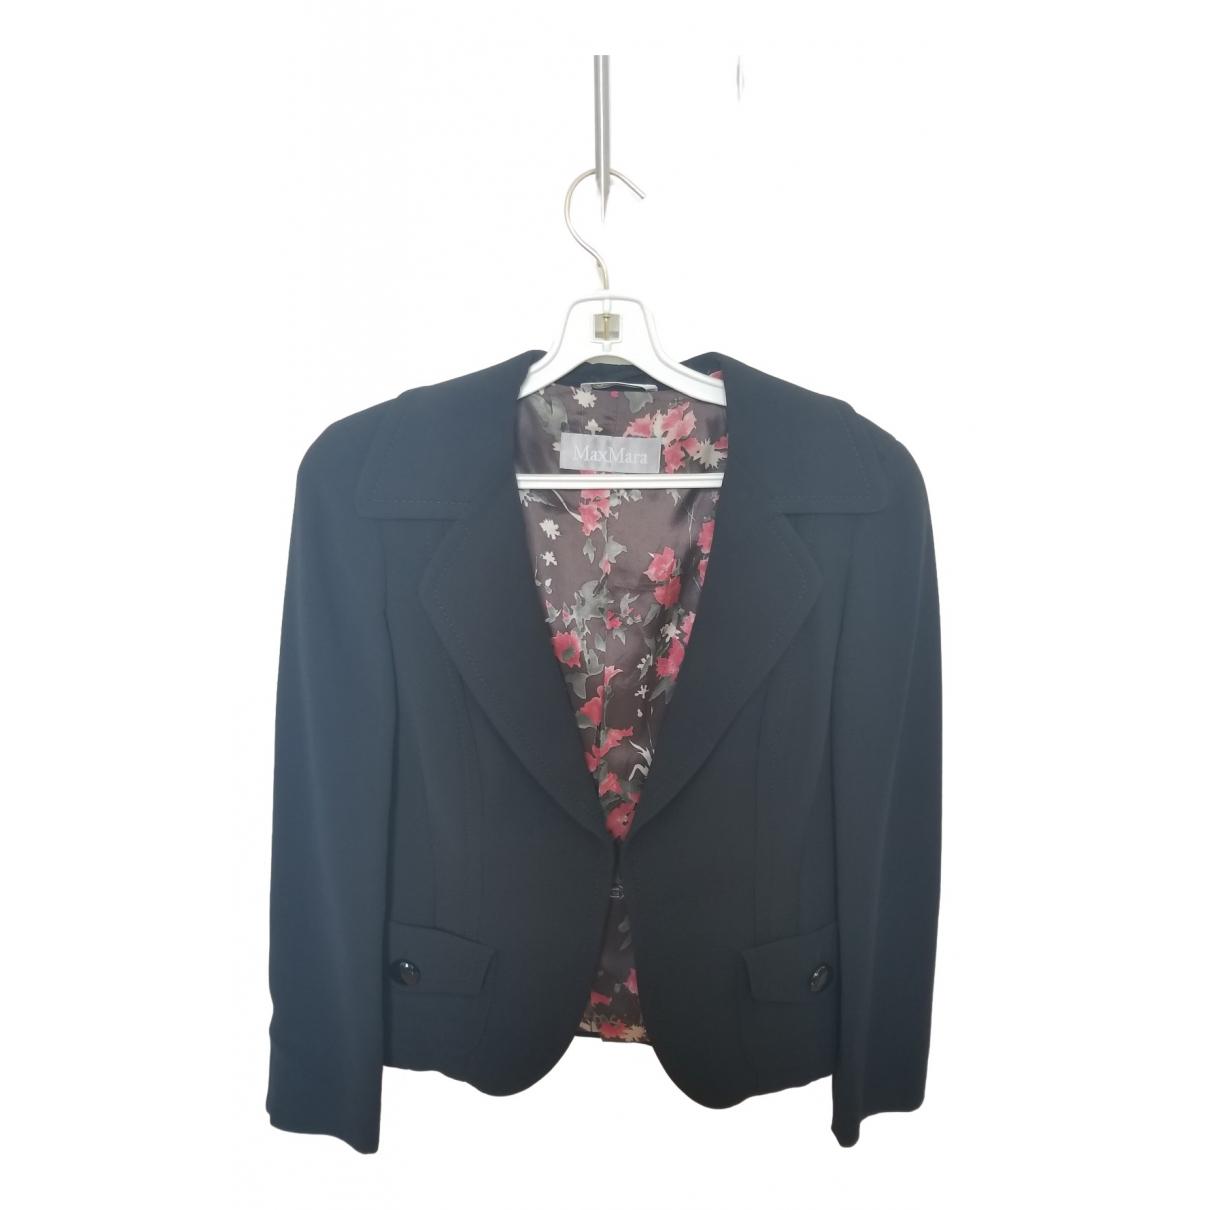 Max Mara \N Black Wool jacket for Women 38 IT